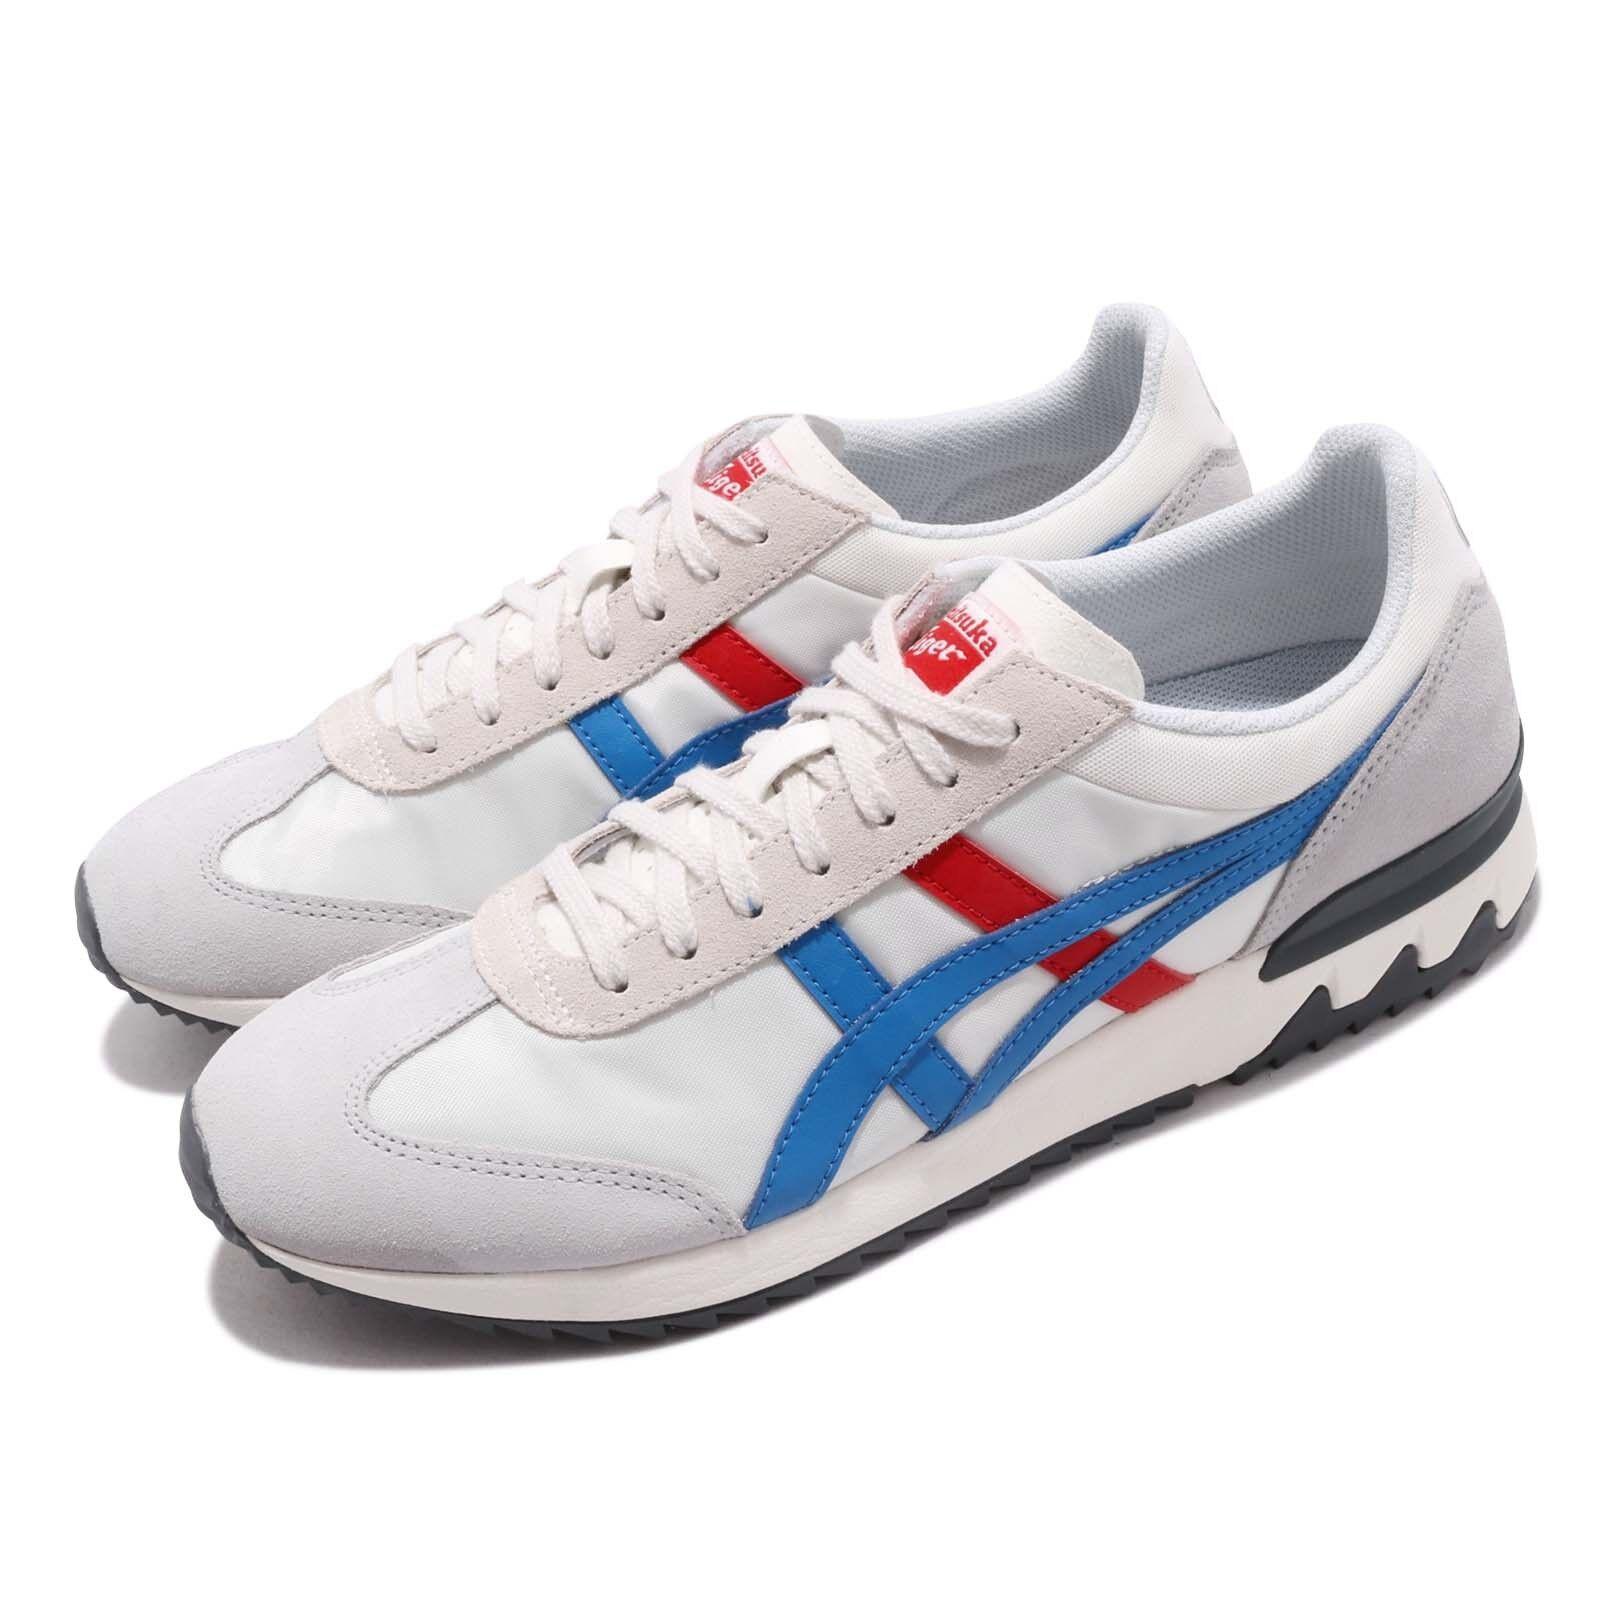 Asics Onitsuka Tiger California 78 EX Cream blueee Red Men shoes 1183A194-100